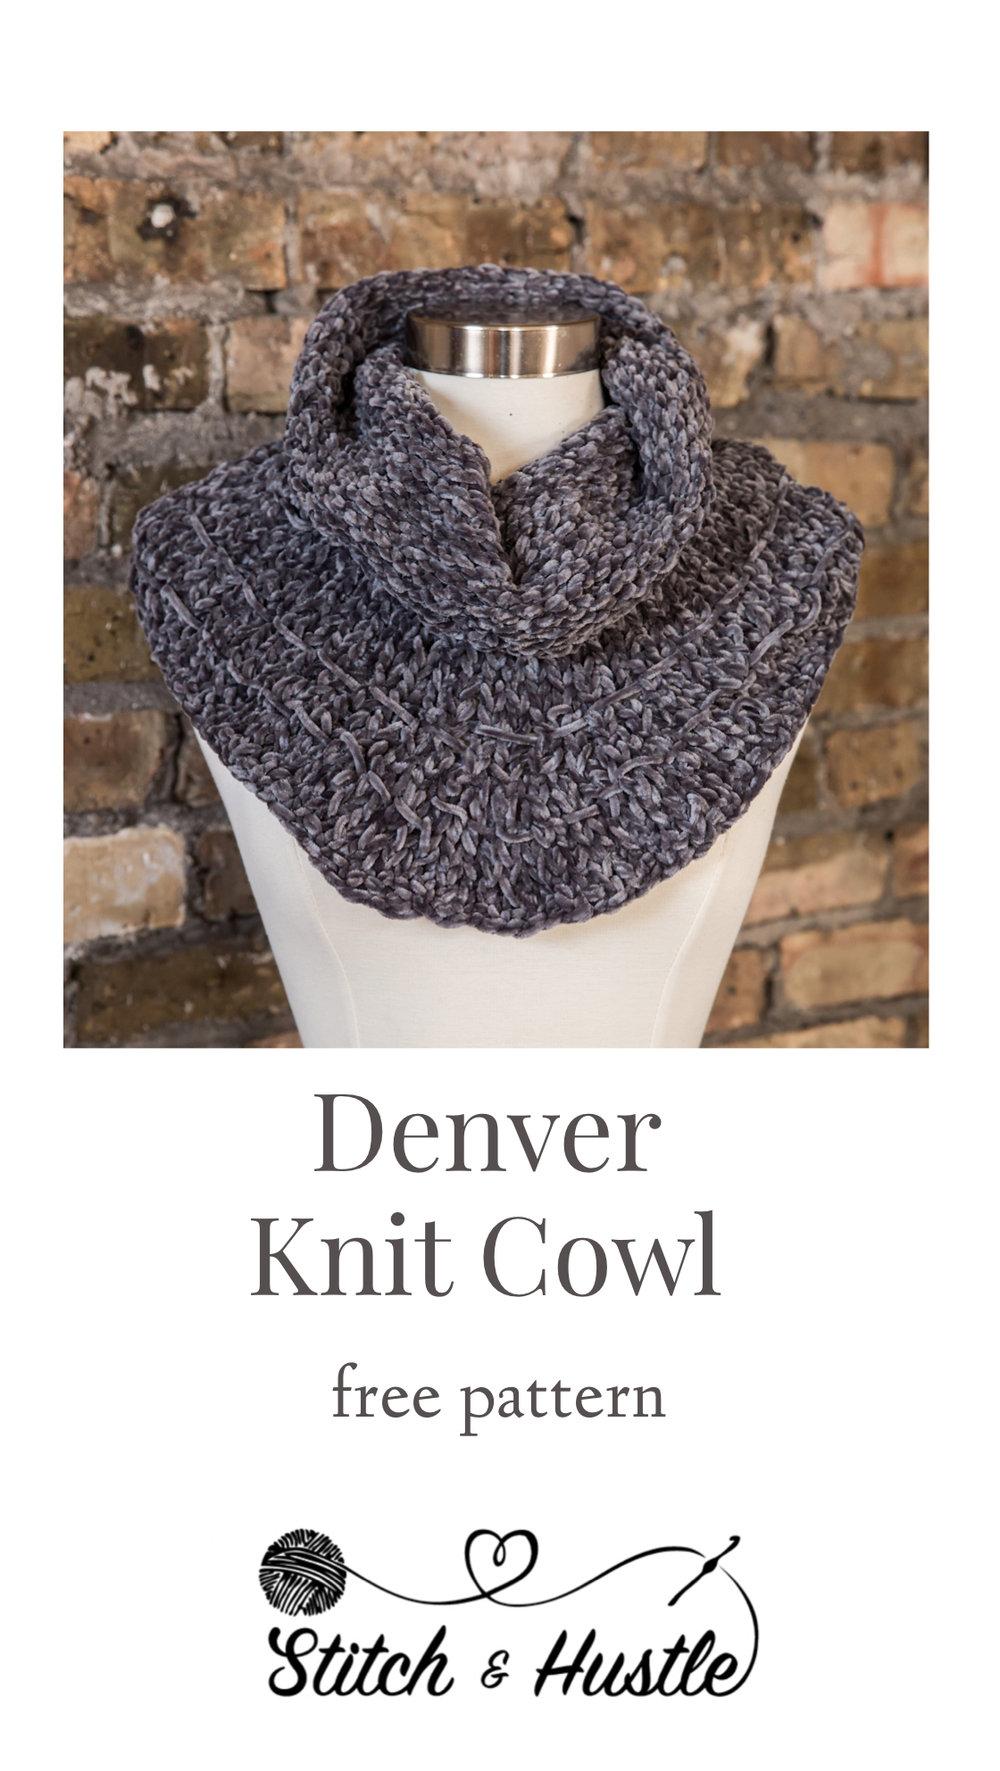 Denver_Knit_Cowl_free-pattern_1w.jpg